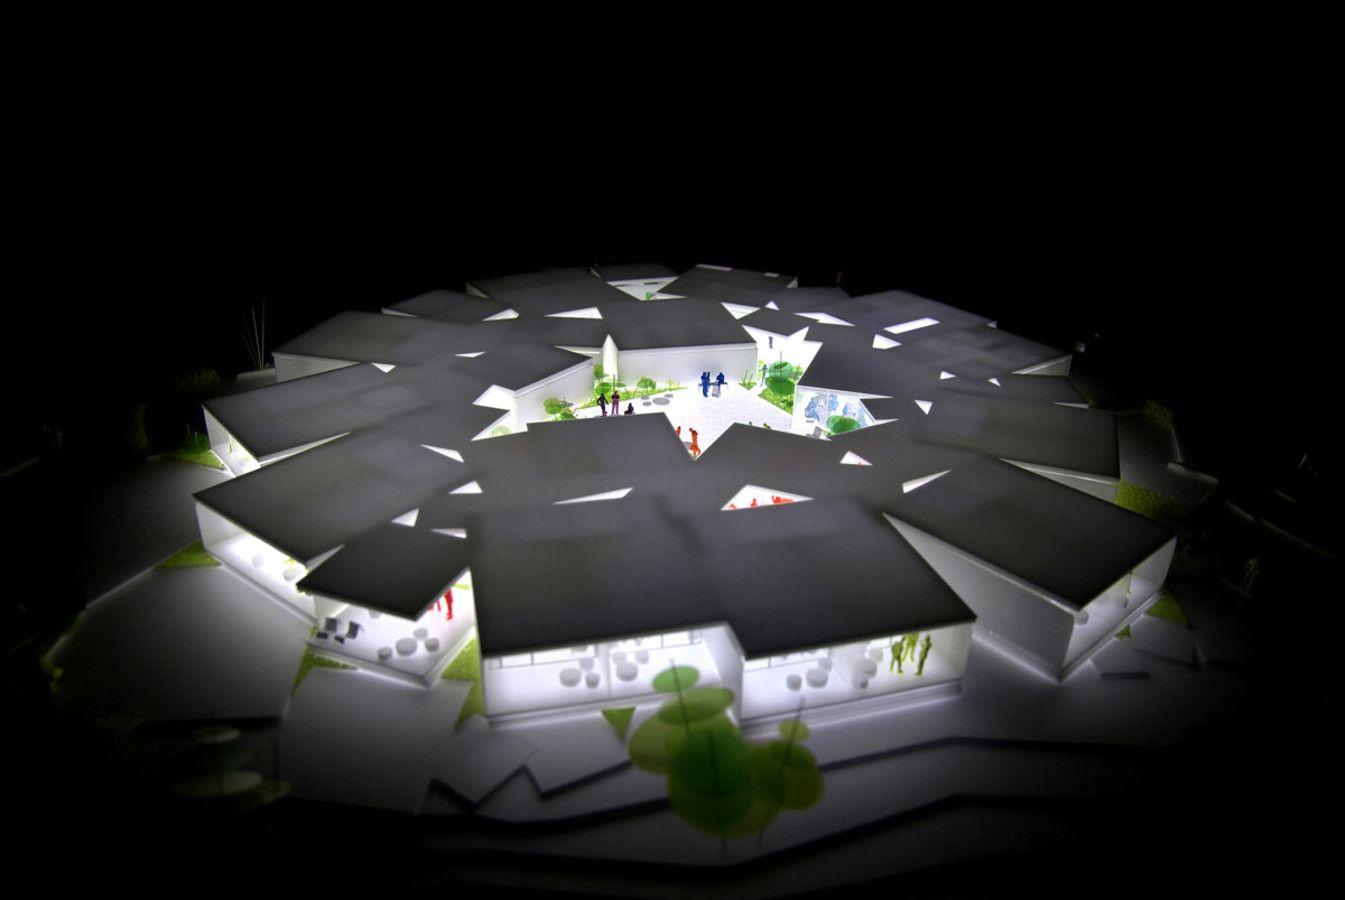 Big bjarke ingels group architecture sydney opera